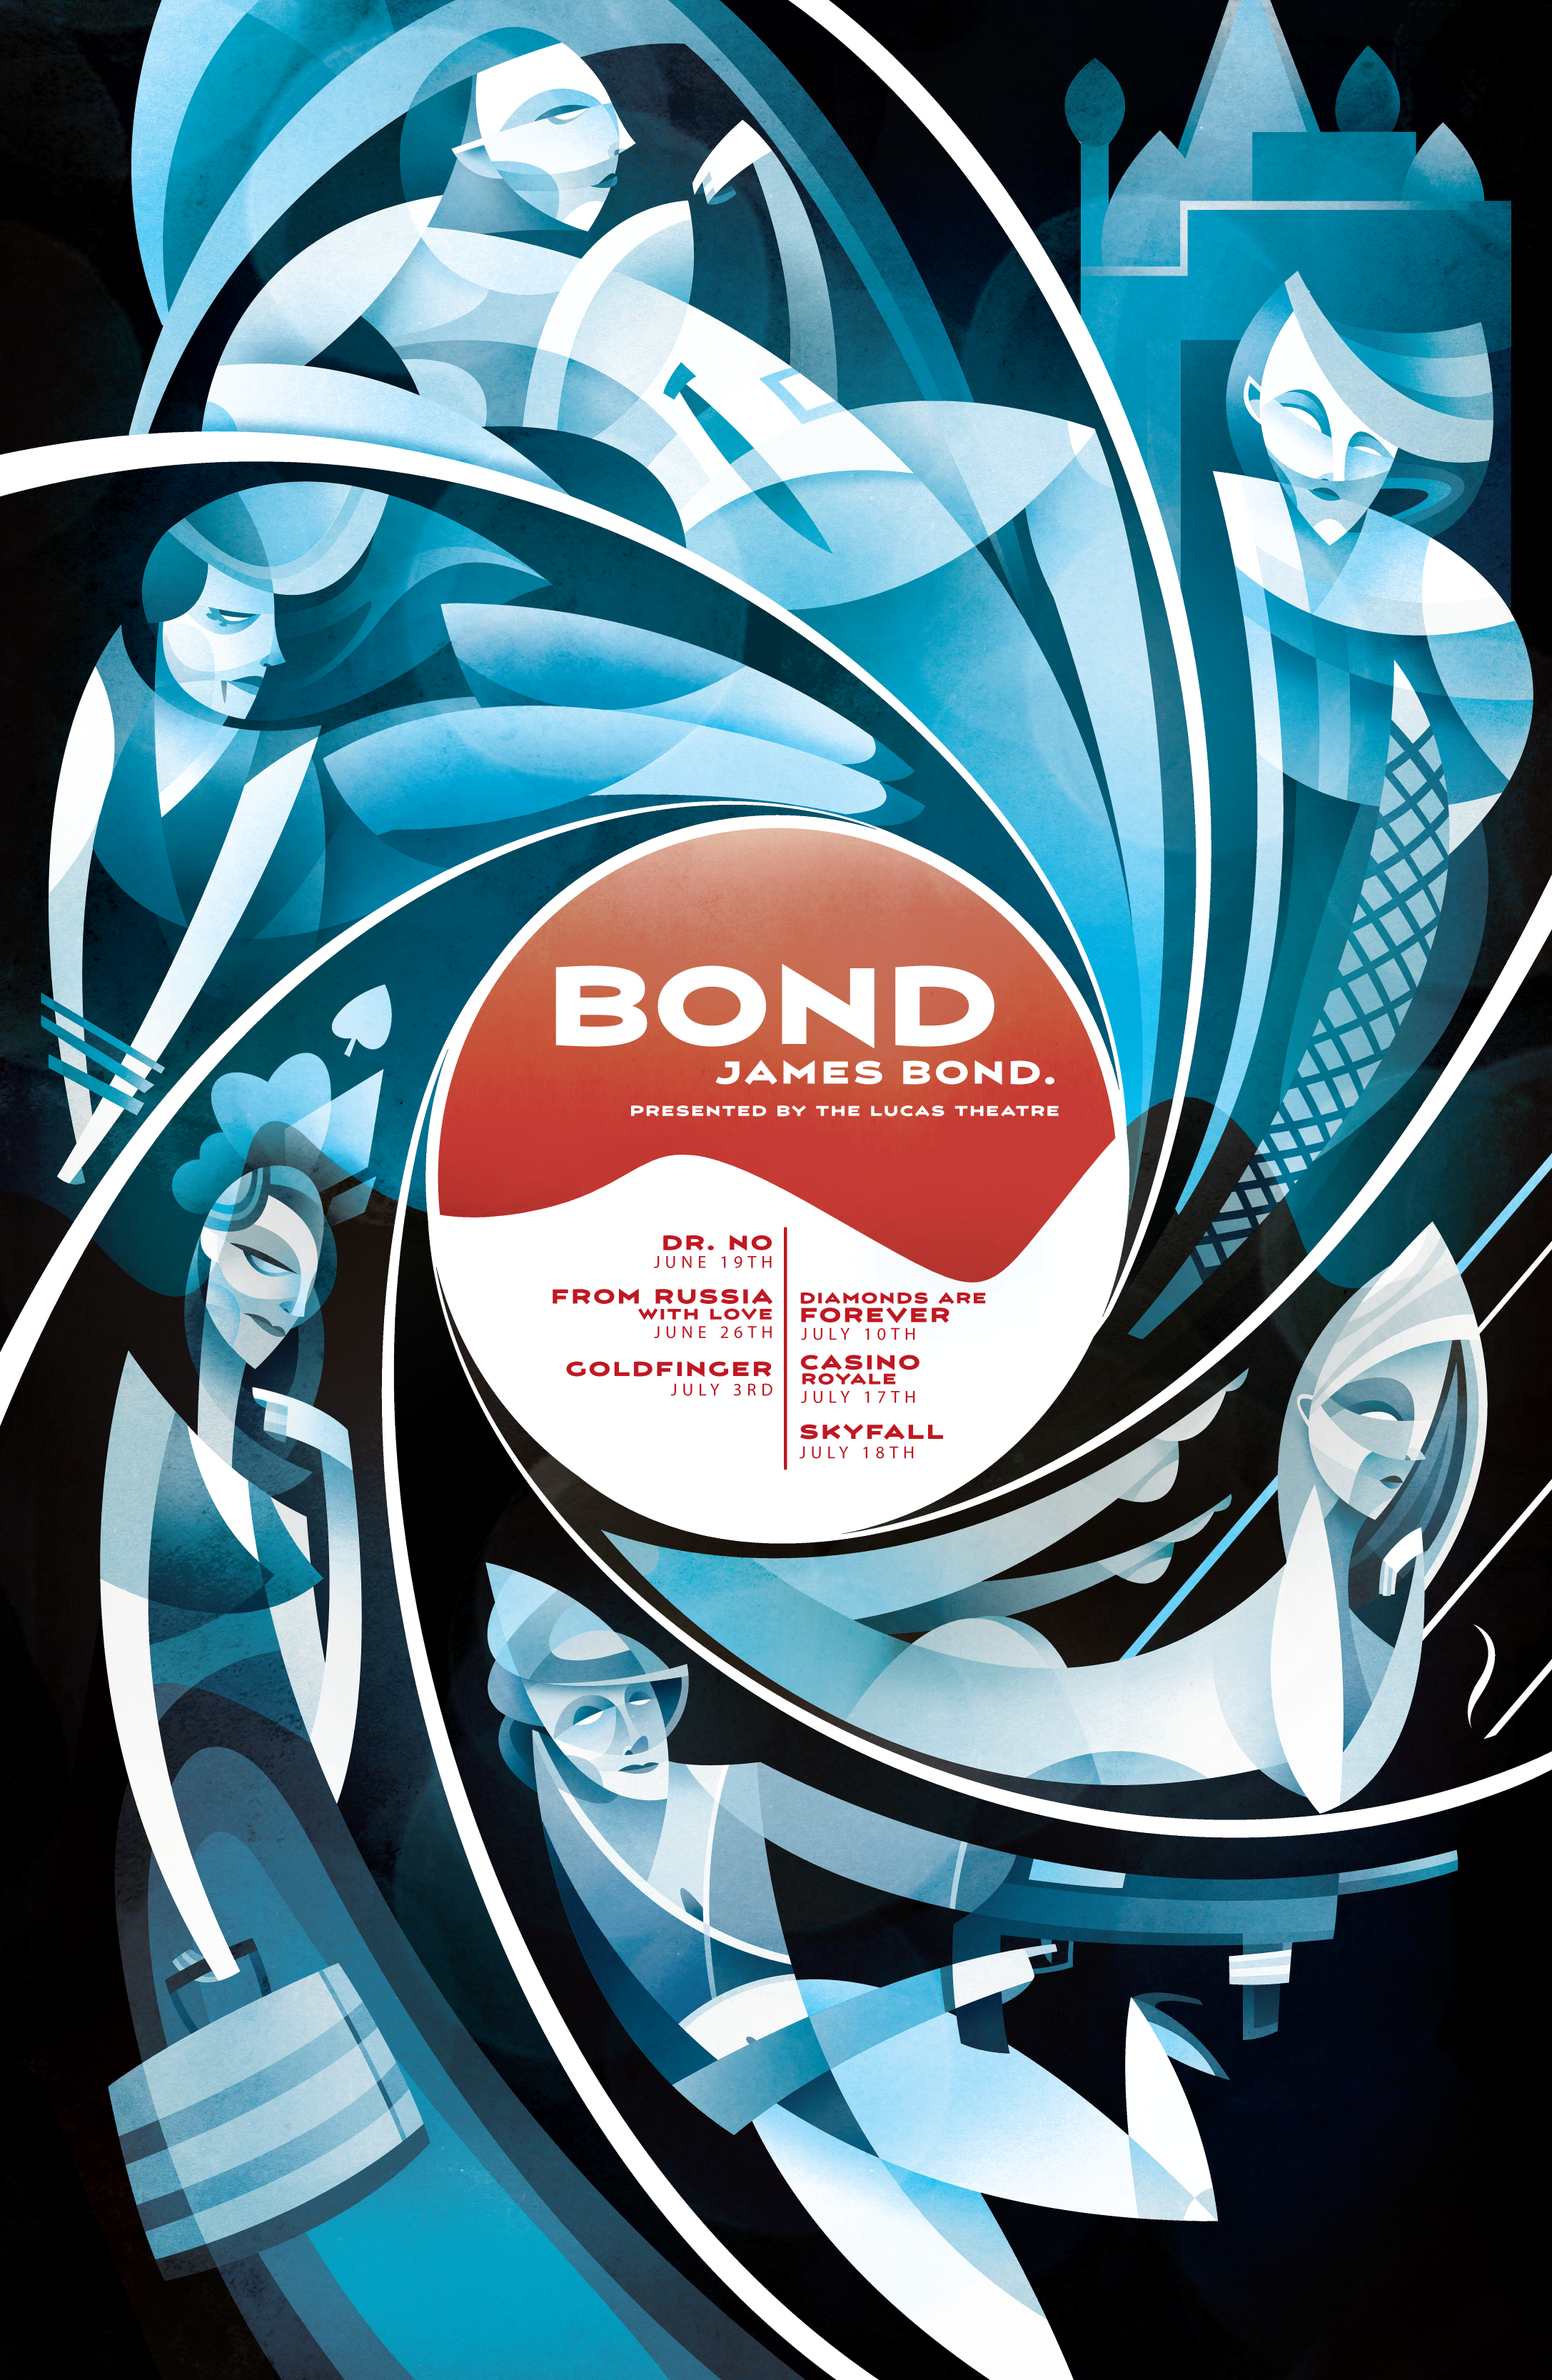 Bond-01.png